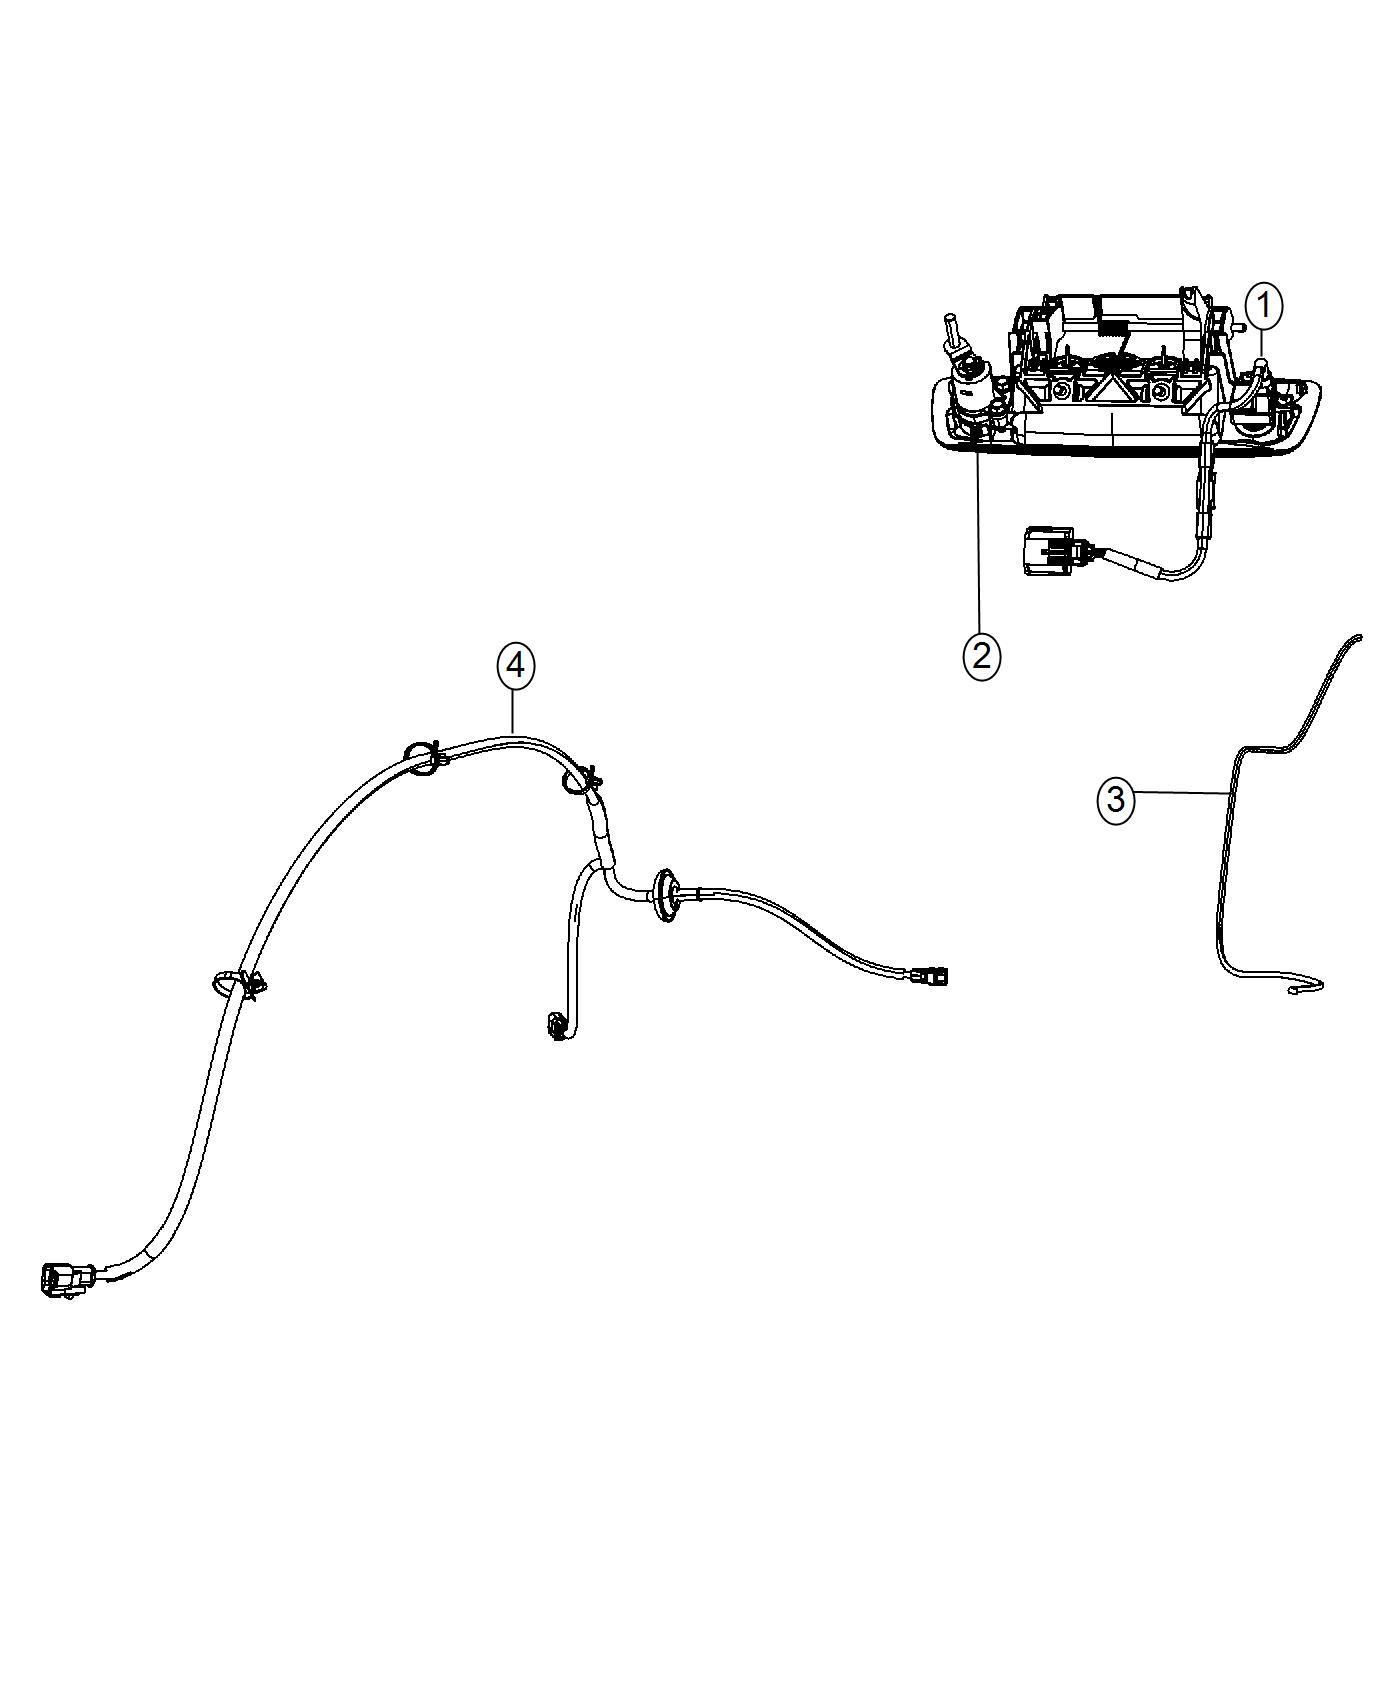 i2331584 Ram Tailgate Camera Wiring Diagram on